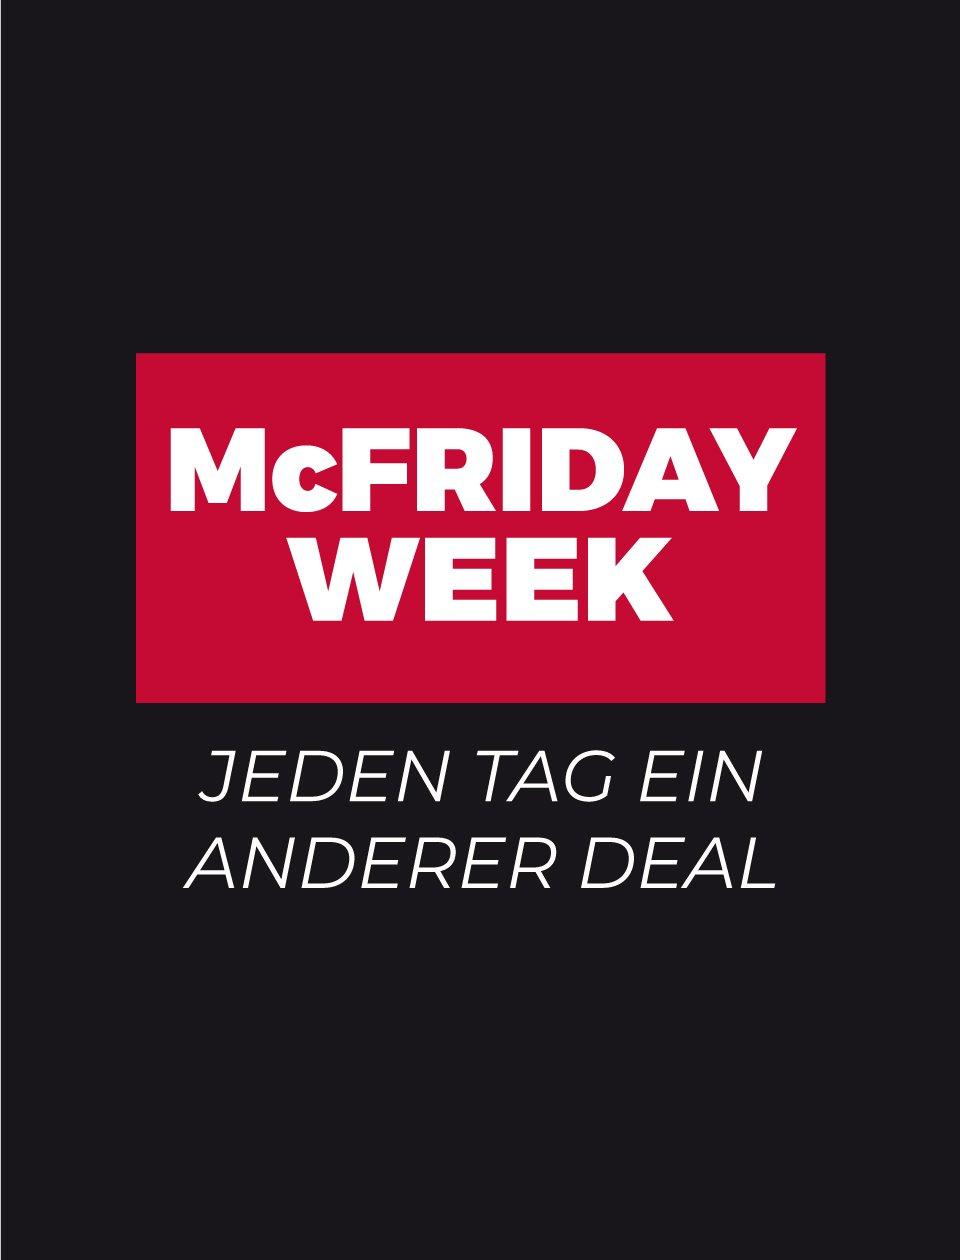 McFriday Week unter anderem Lowe Alpine Airzone Trek+ 45:55